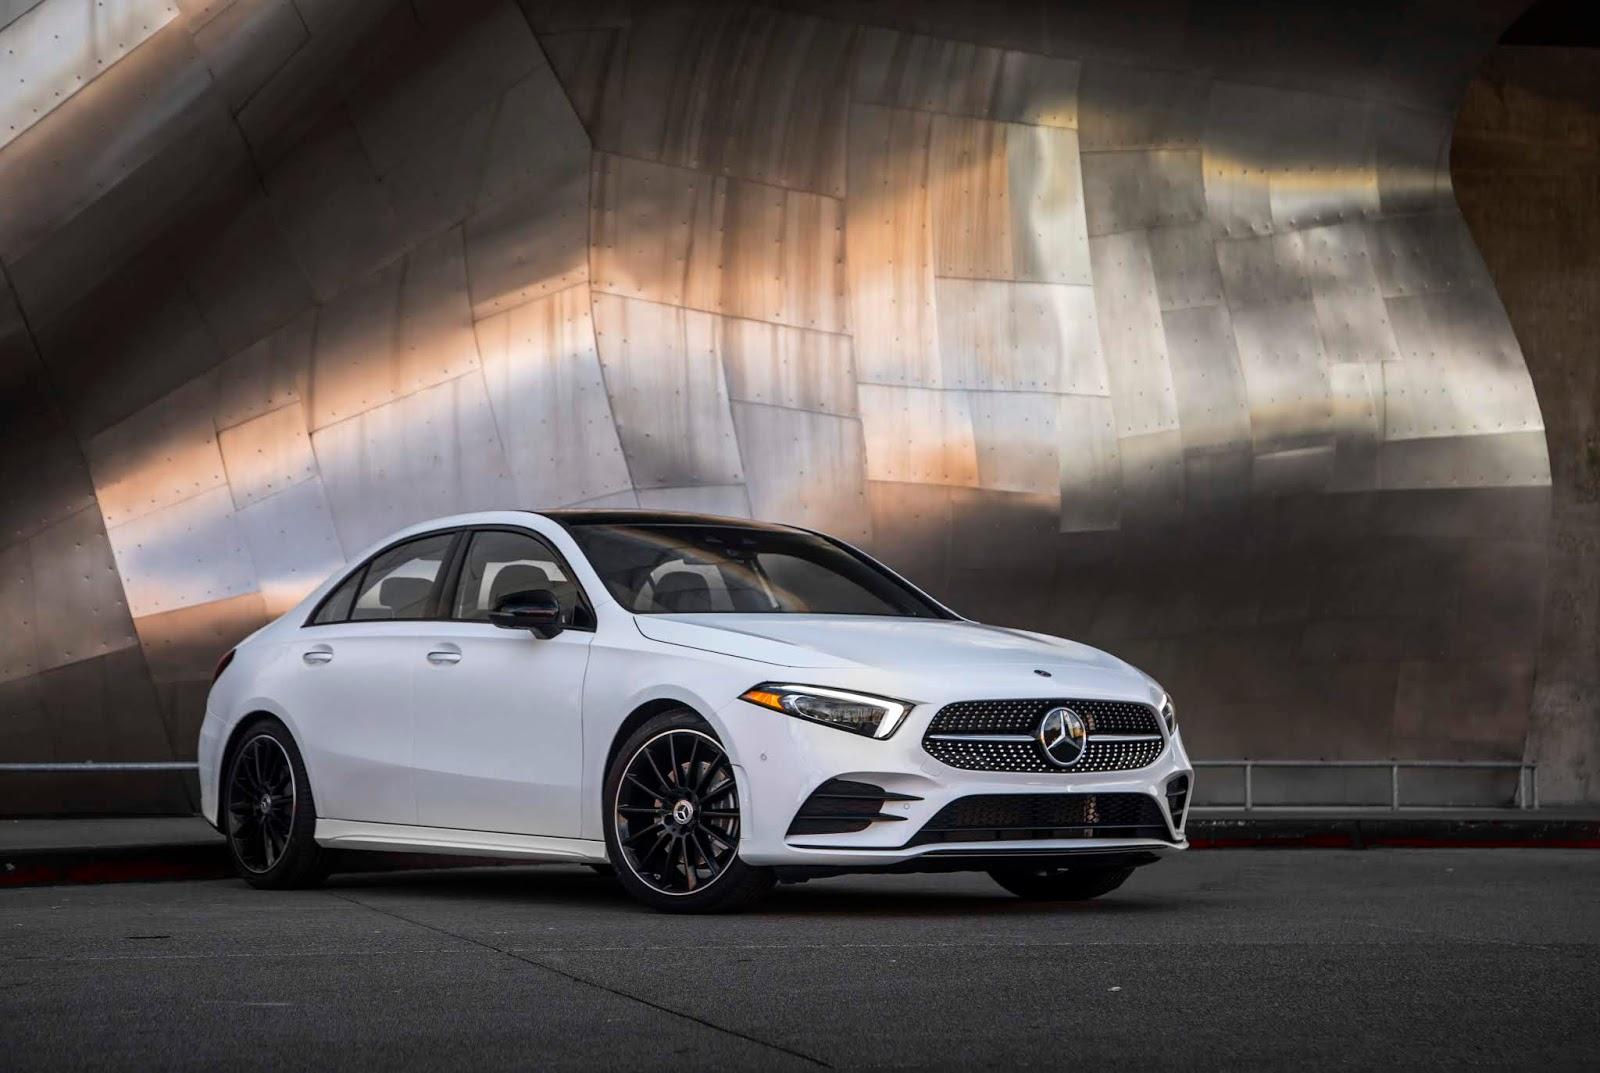 18C0775 019 Από 28.230 ευρώ η τιμή της Mercedes A-Class Sedan Luxury sedan, Mercedes, Mercedes AMG, premium sedan, sedan, zblog, καινούργιο, καινούρια, τιμες